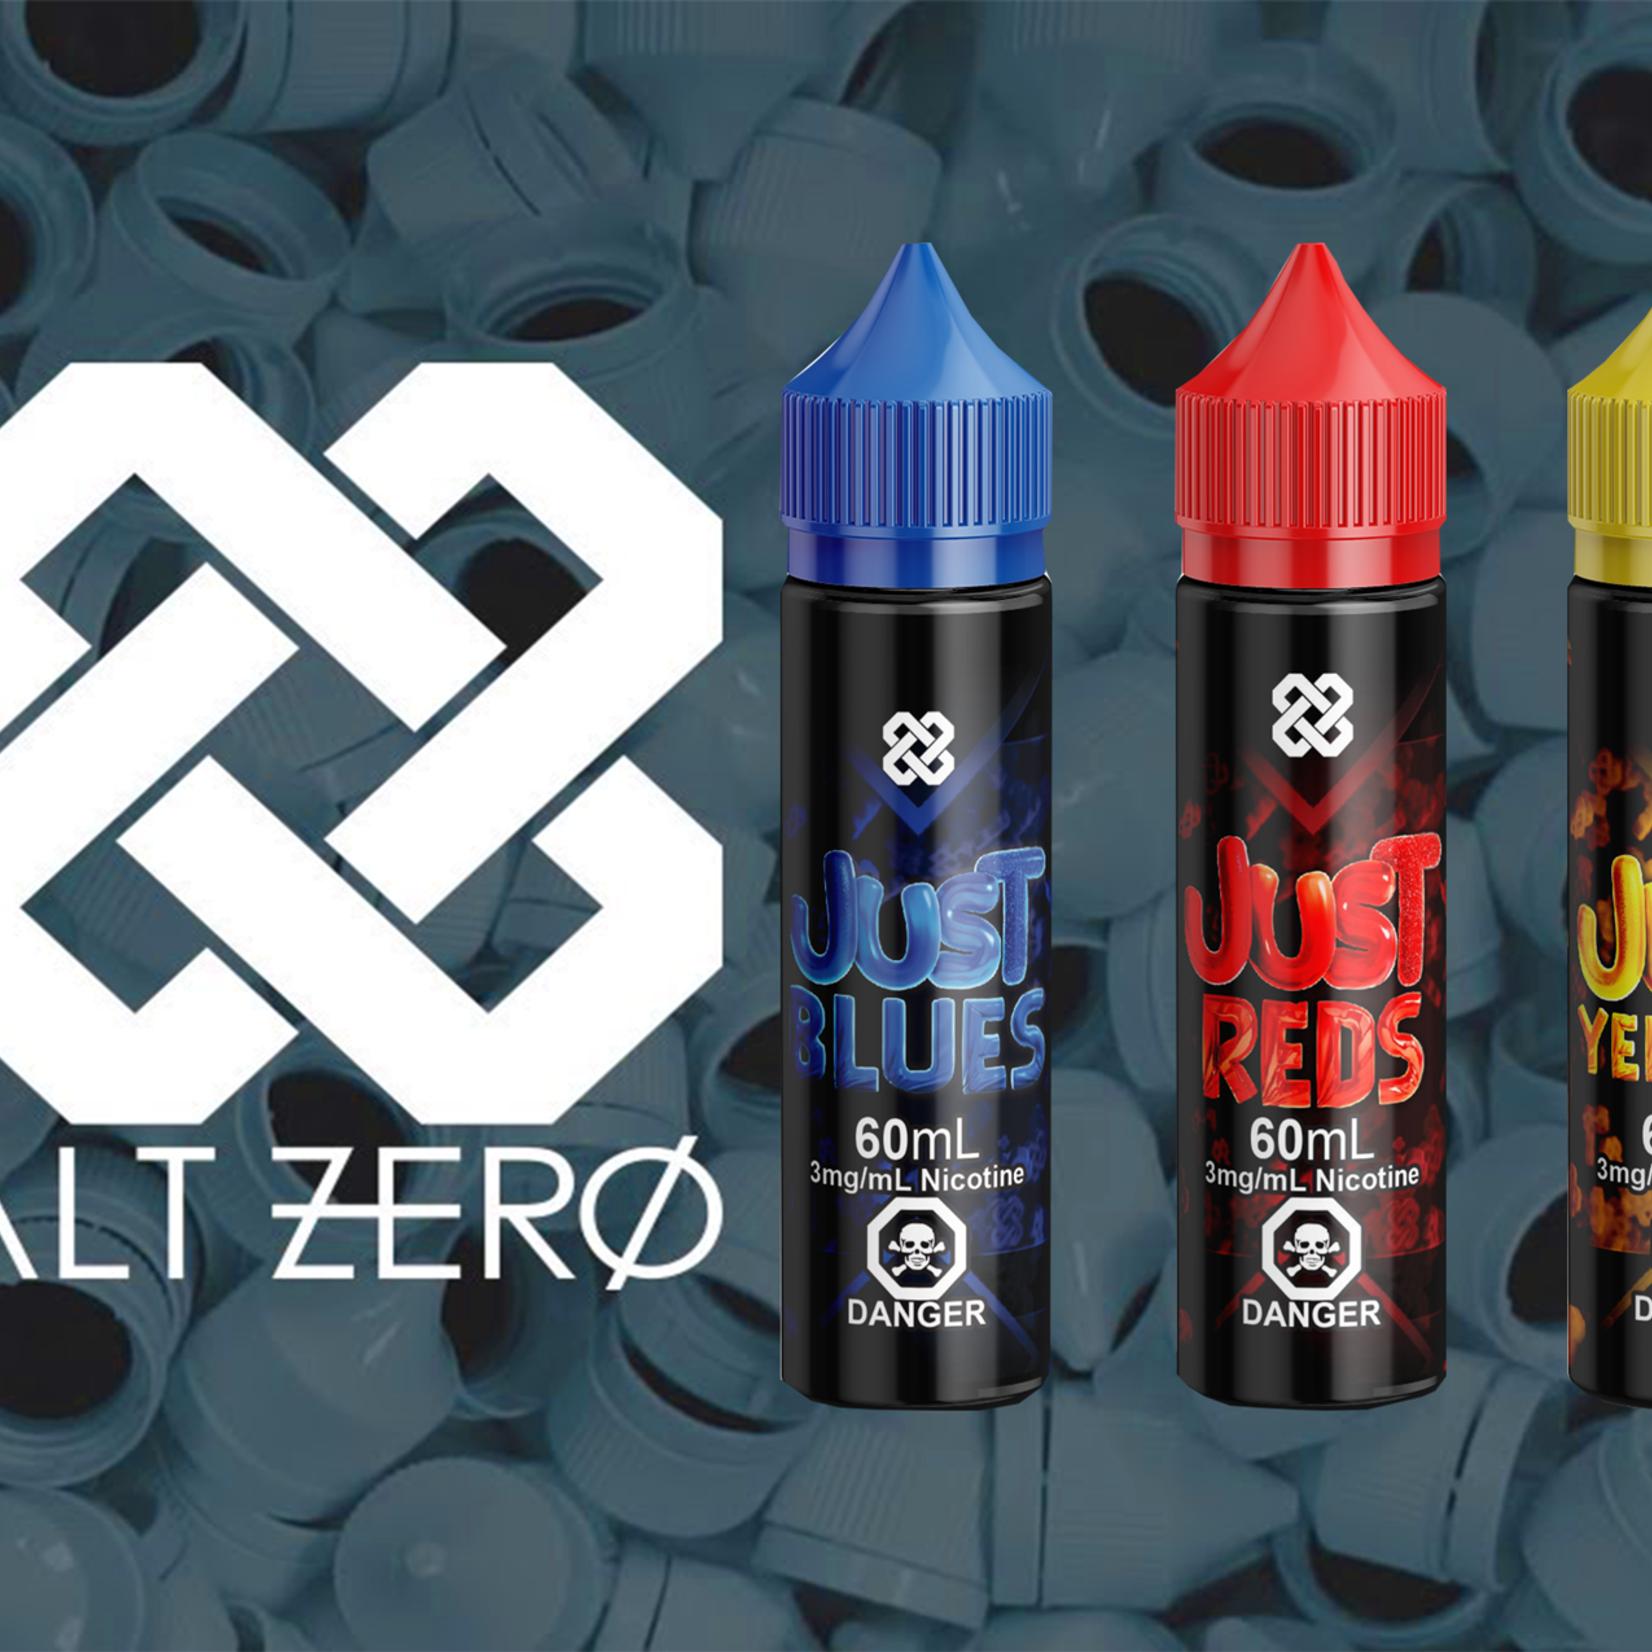 Alt Zero - Just Blues